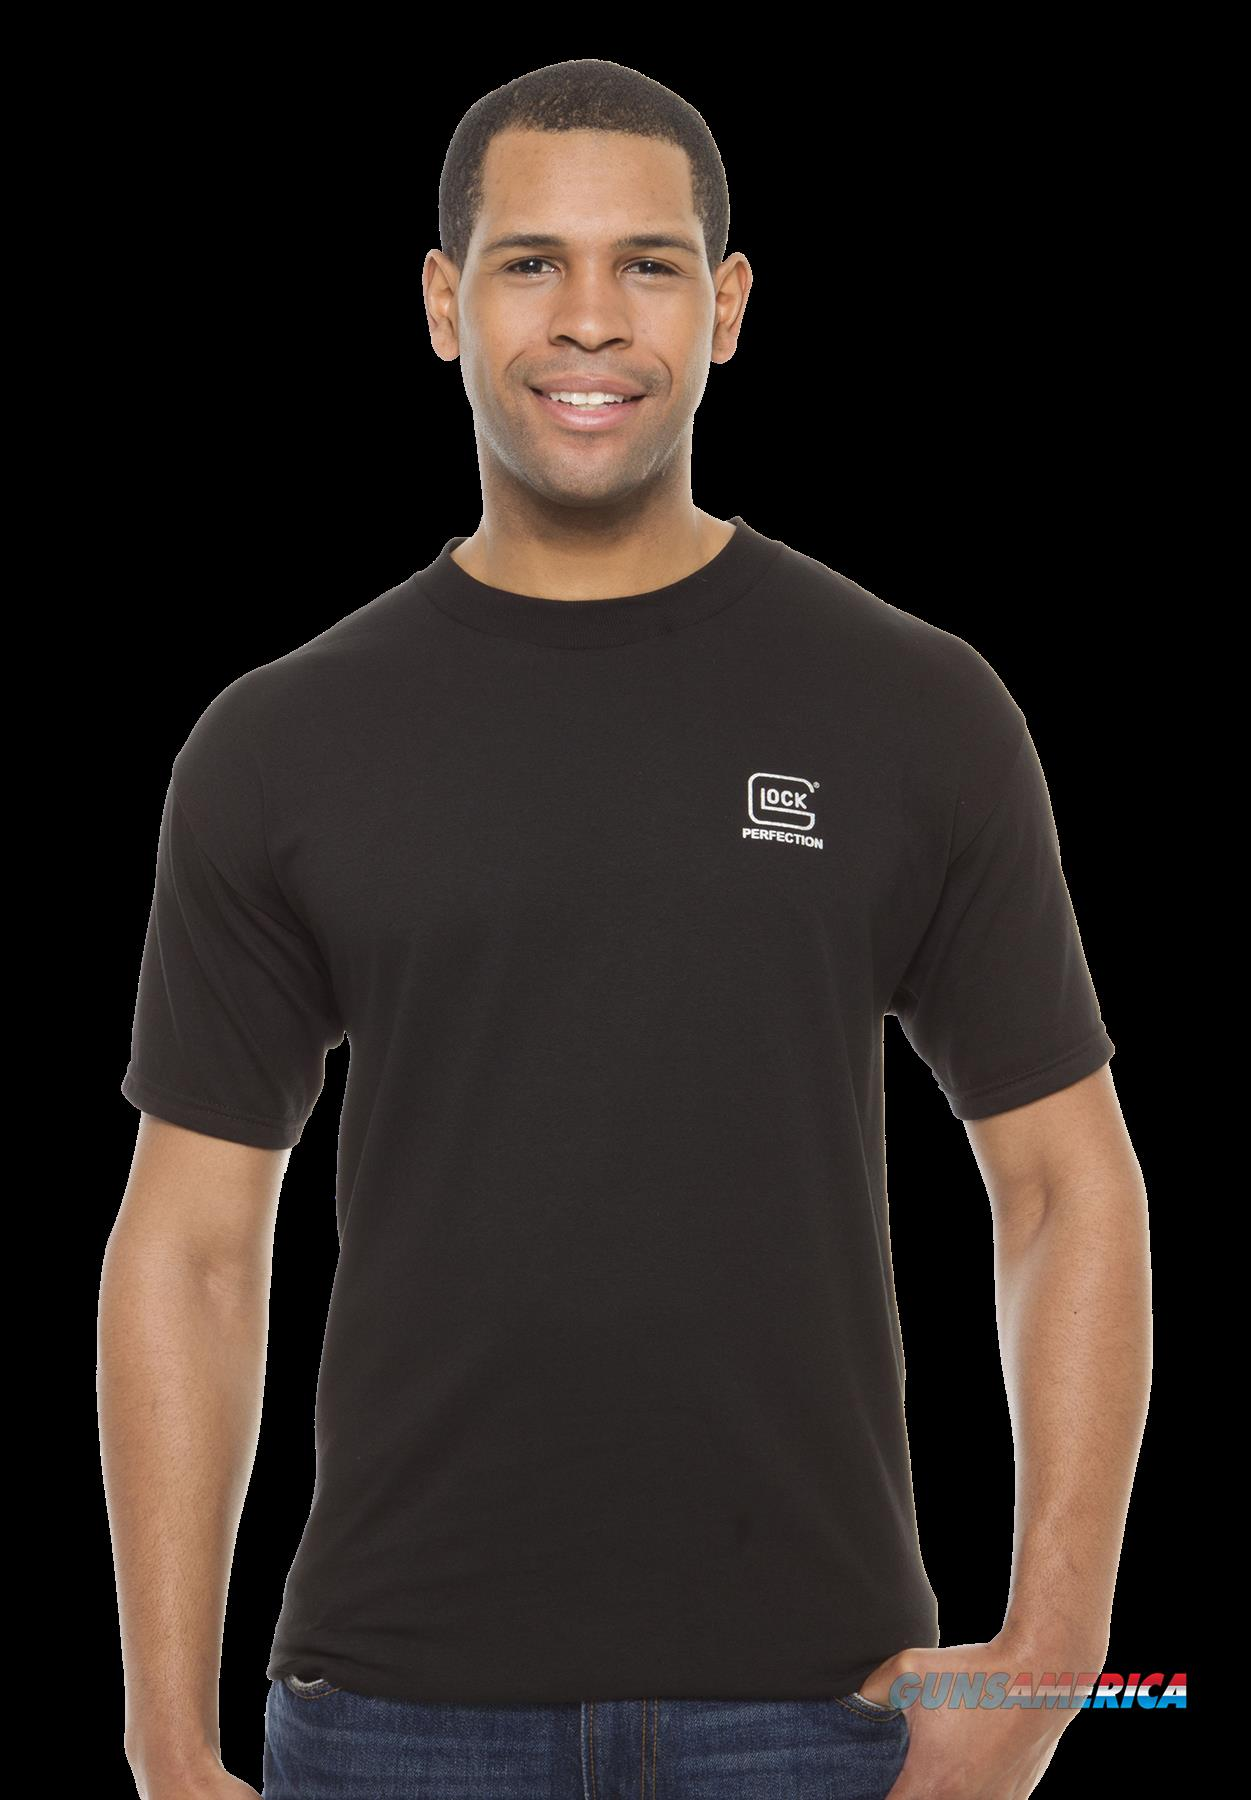 Glock T-shirt, Glock Aa11004  Perfection Tshirt Black         Med  Guns > Pistols > 1911 Pistol Copies (non-Colt)